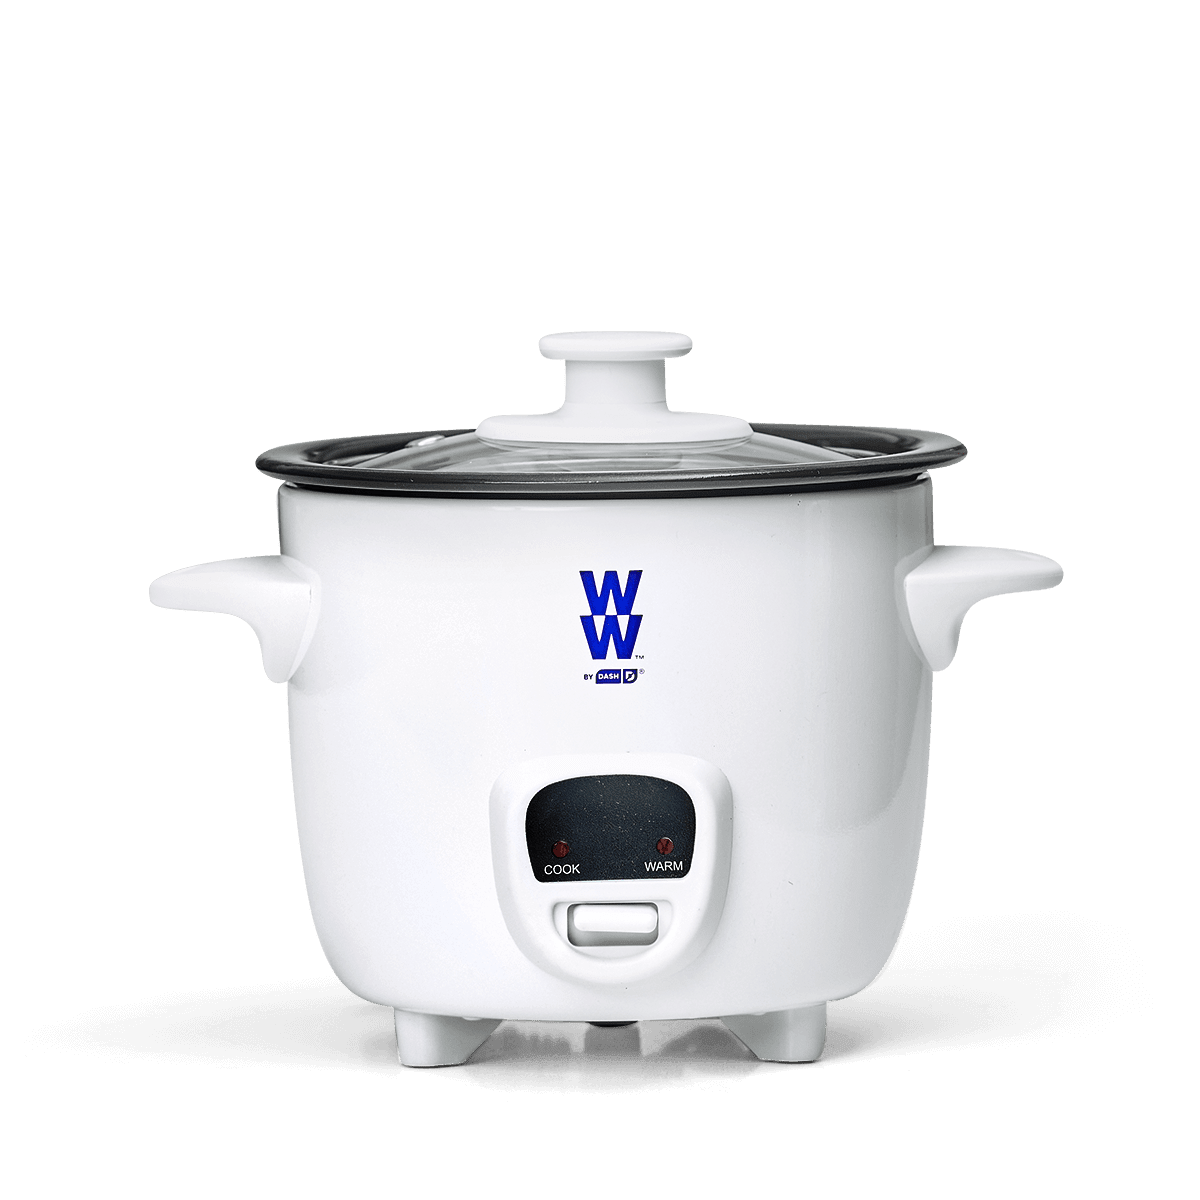 WW by Dash Mini Rice Cooker